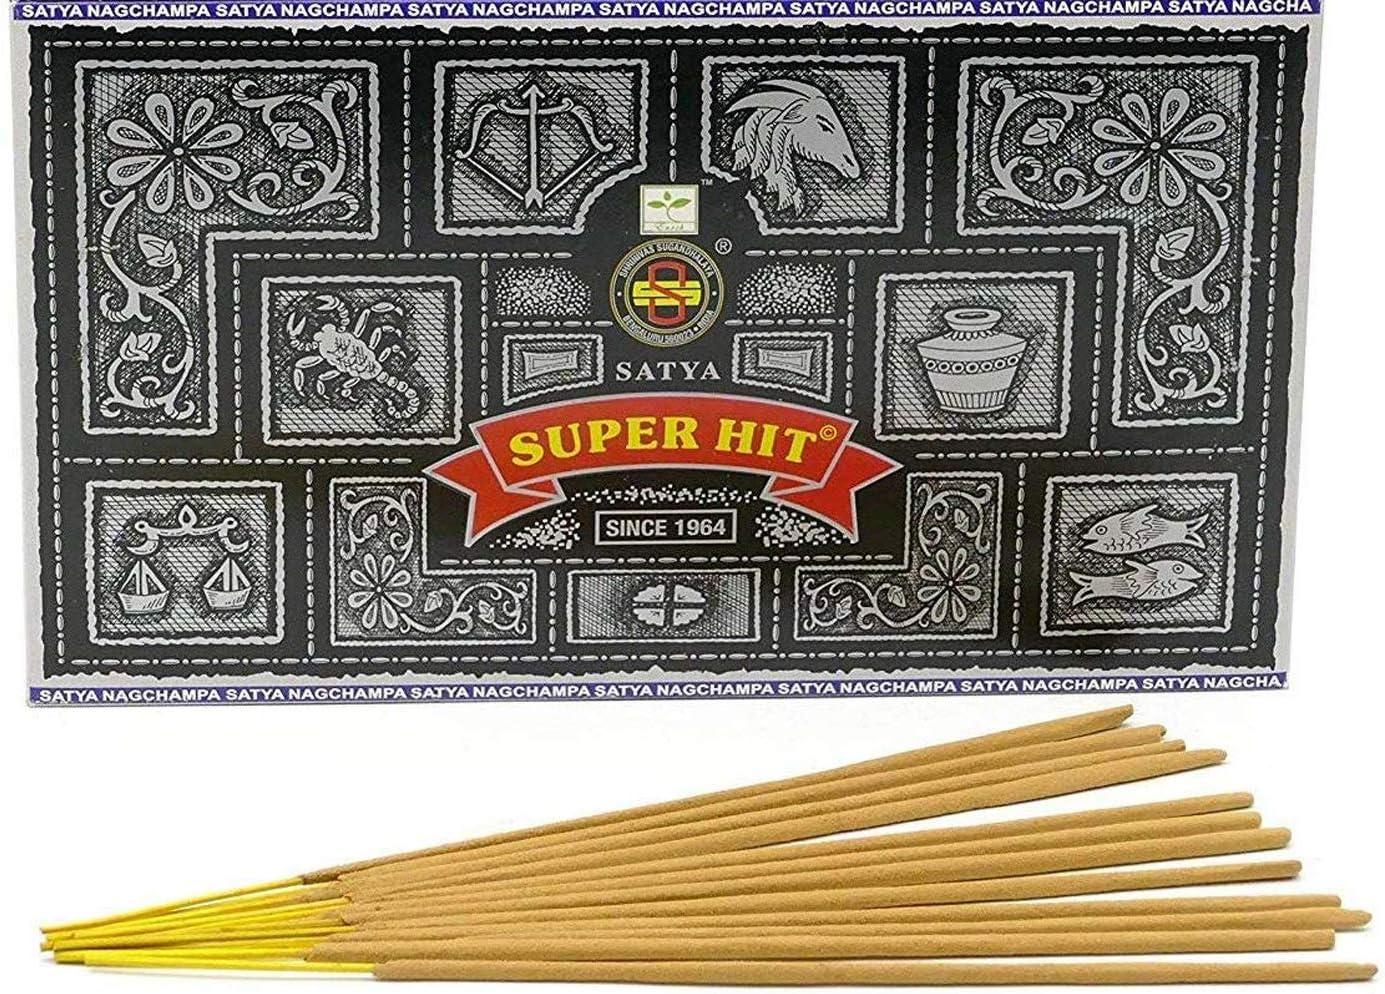 incienso Nag Champa Super Hit Palos Incienso, Madera, Multicolor, 22 x 13 x 8 cm, Unicolor, Caja de 12 Paquetes, 180